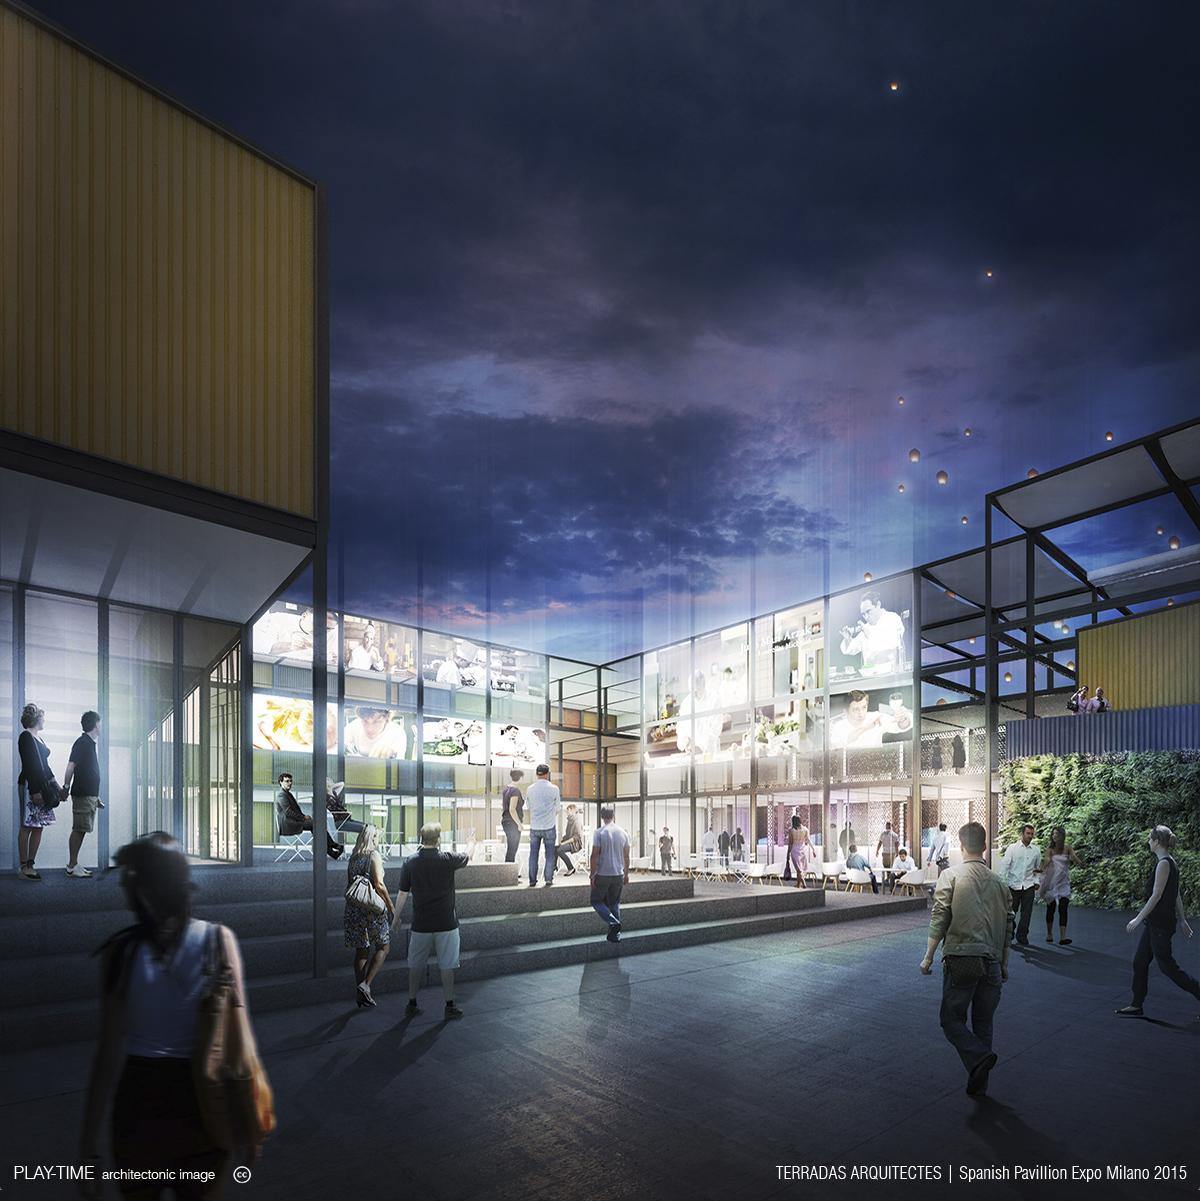 terradas arquitectes - spanish pavillion expo milano 2015 02